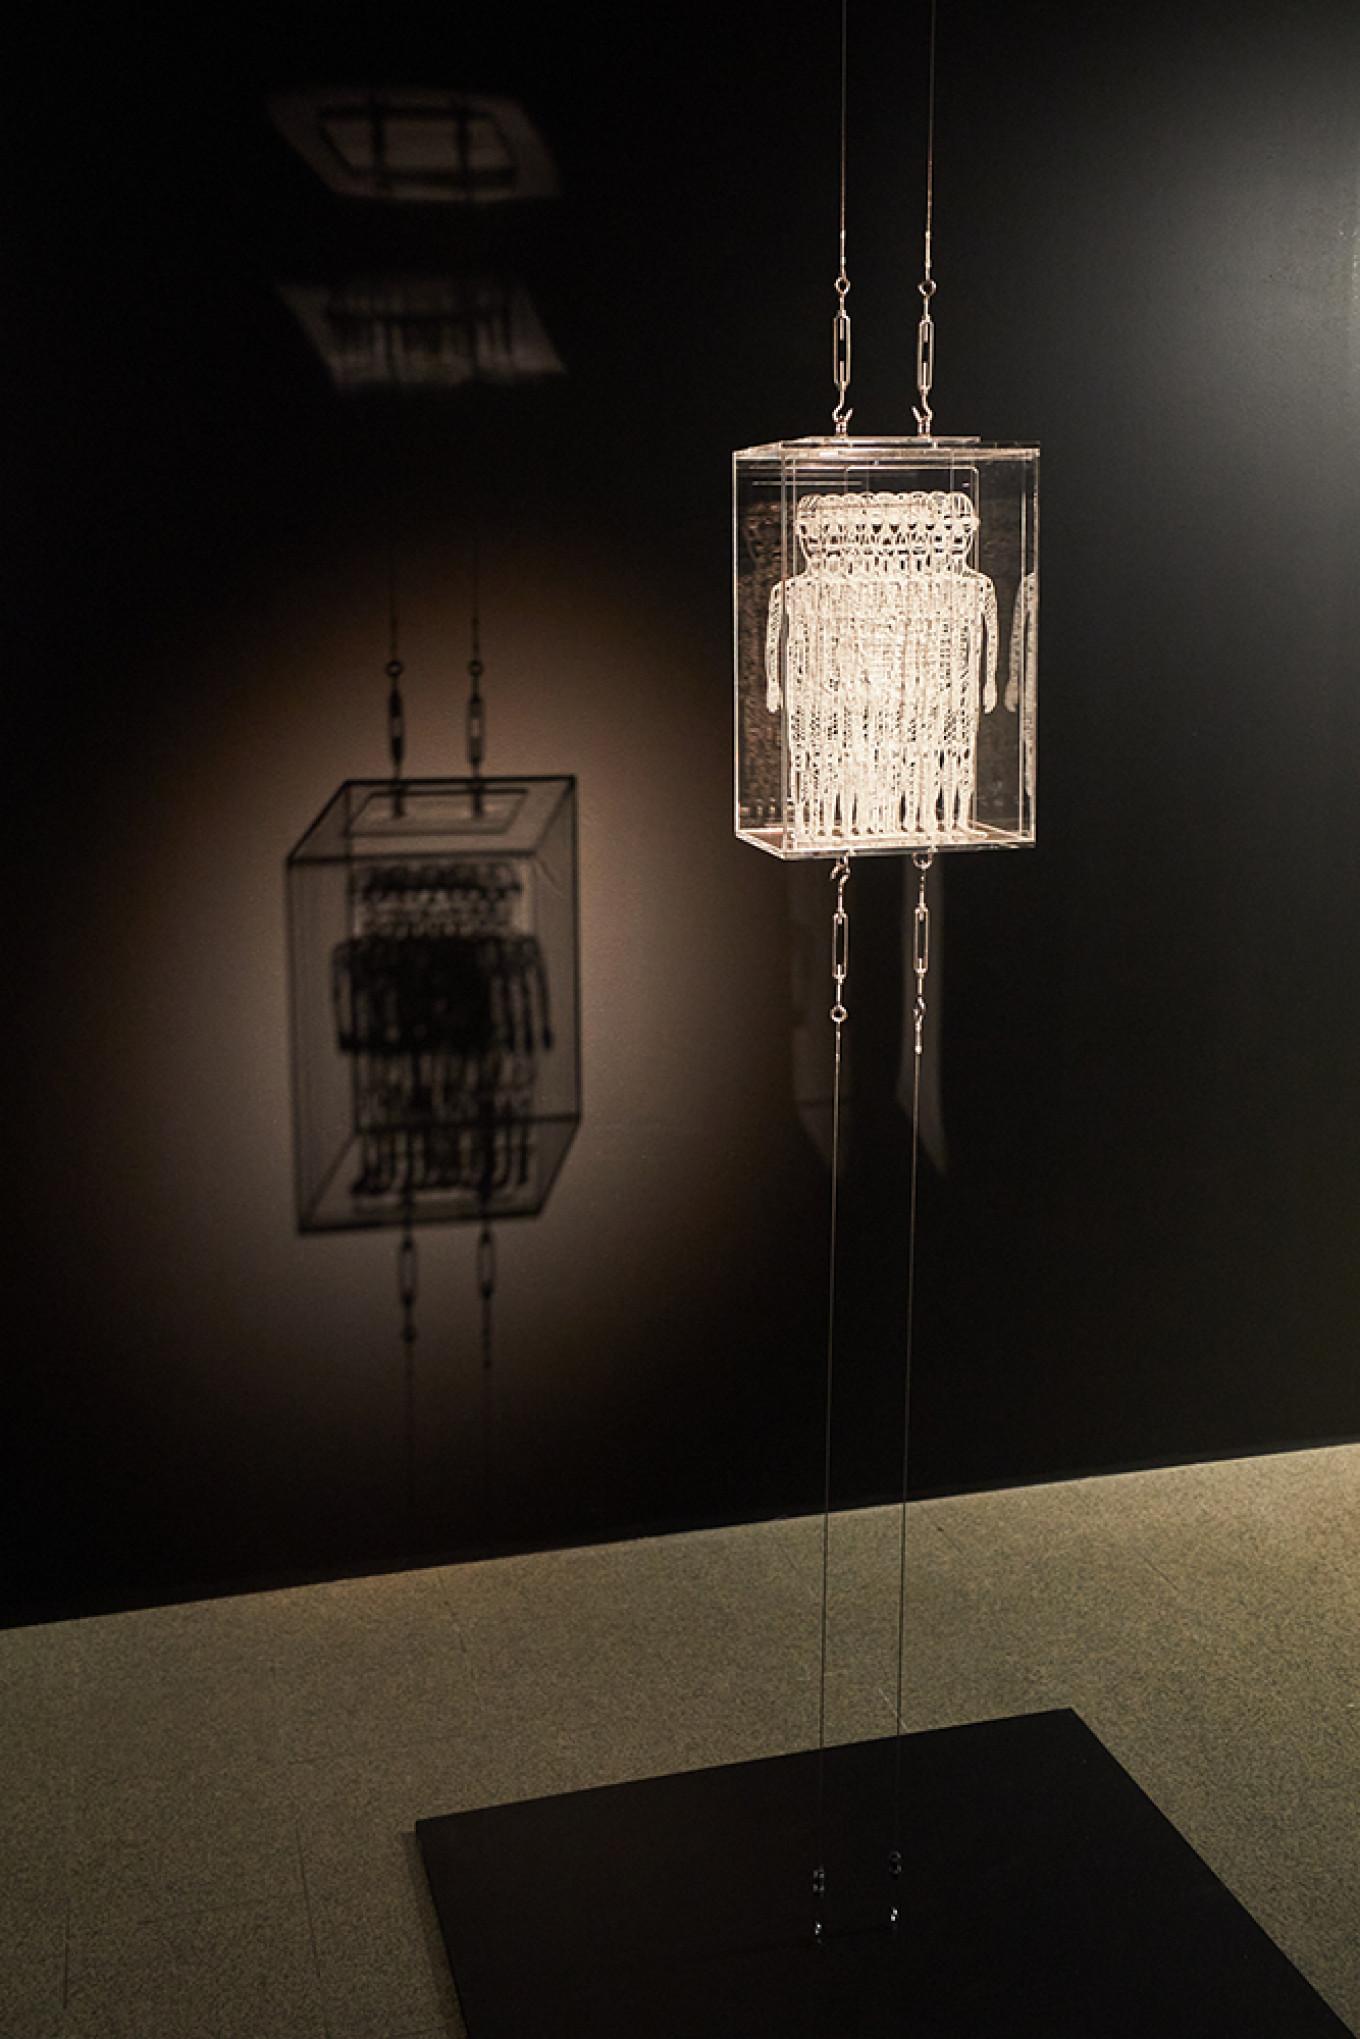 """Elevator"" by Dmitry Zheravov Courtesy of Manage Central Exhibition Hall"